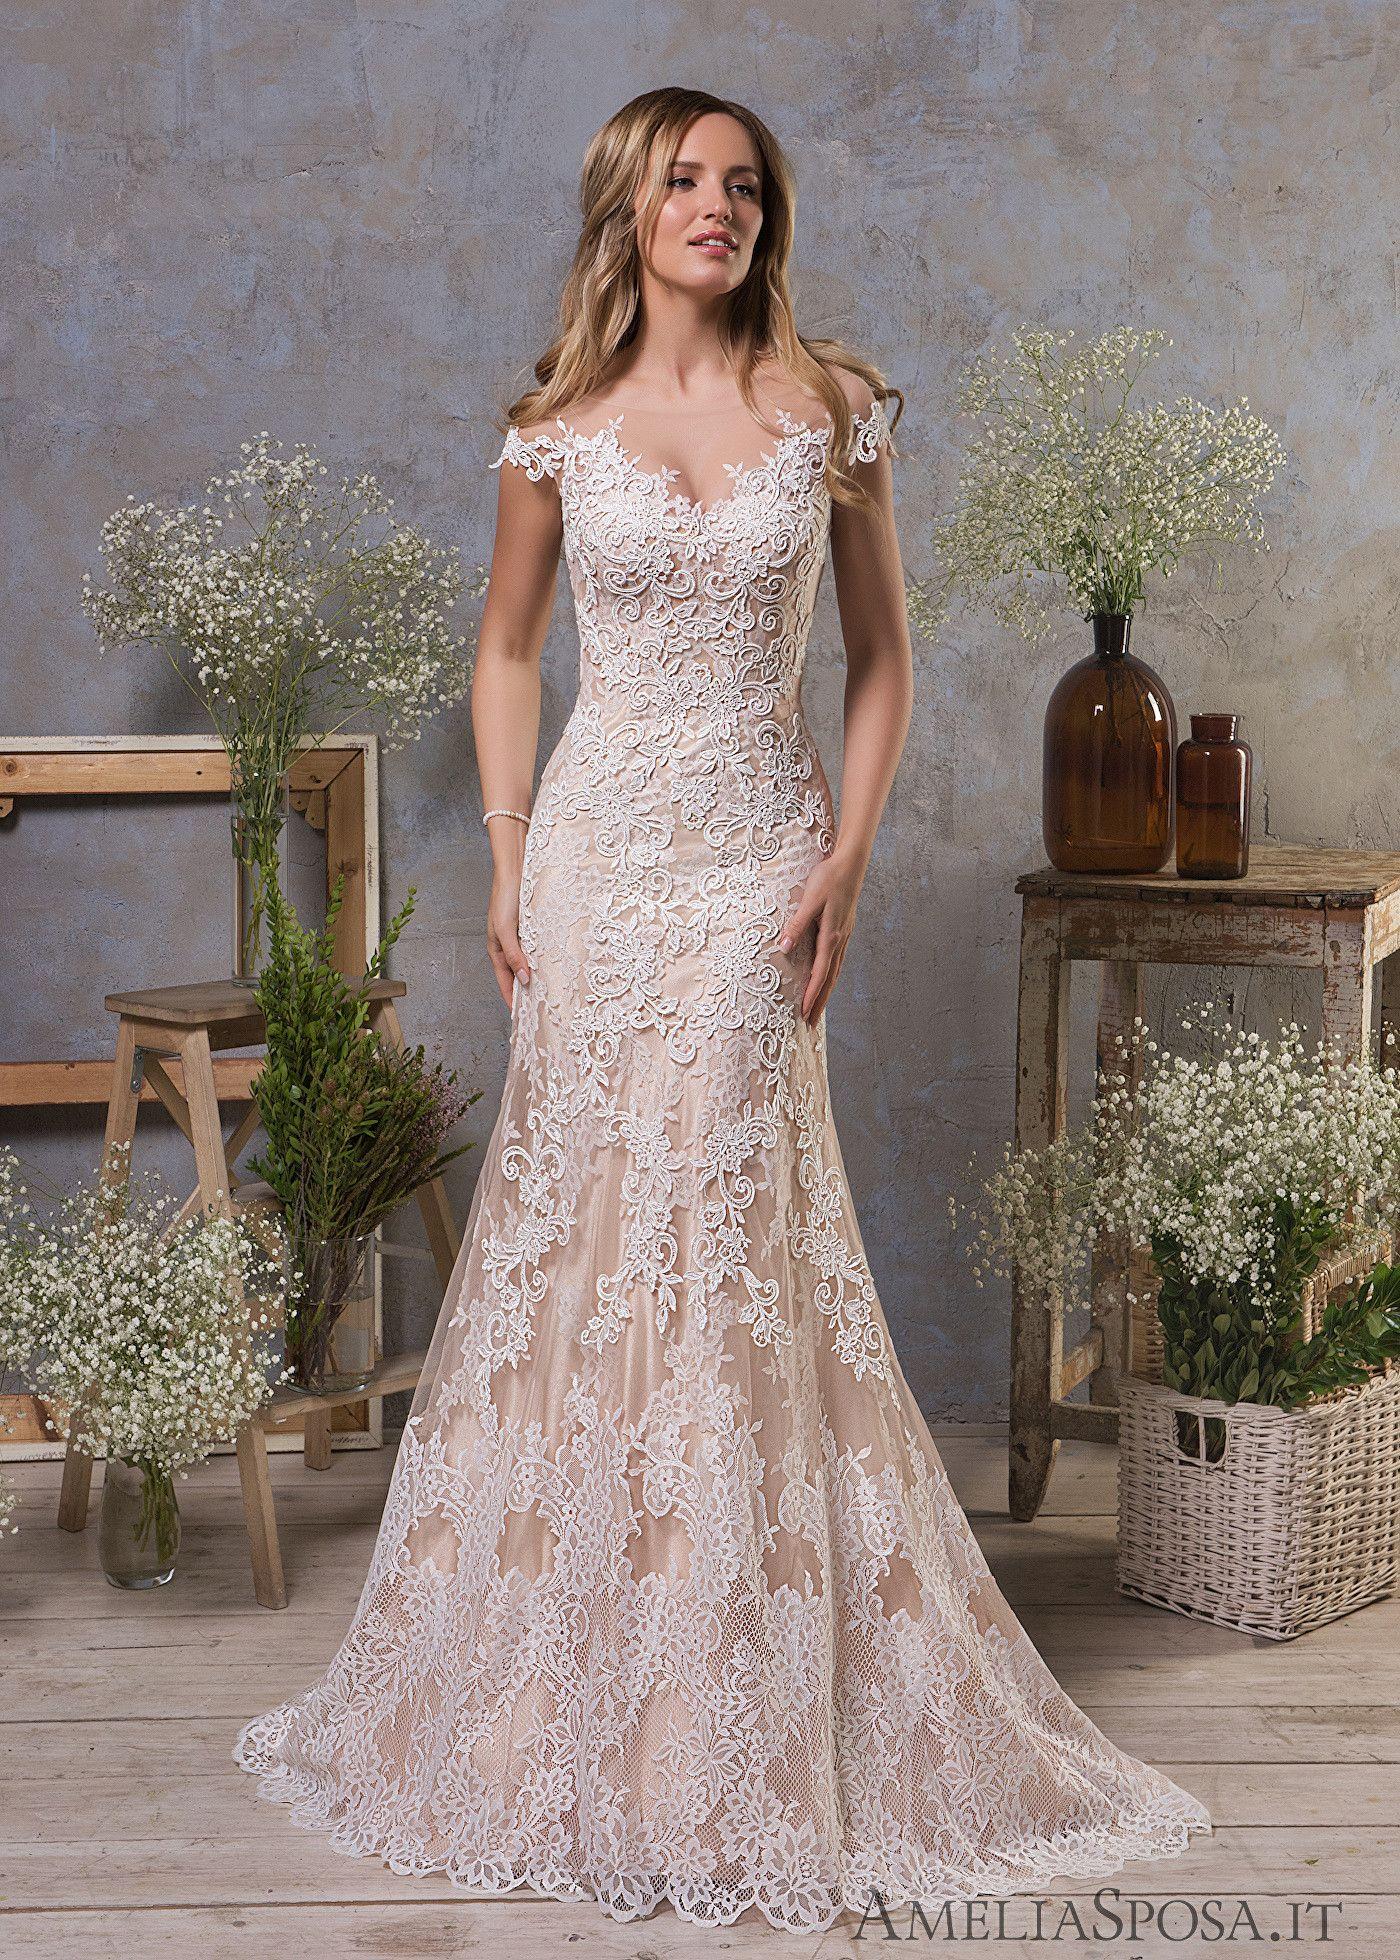 4302df892 Vestidos De Noiva Preços Champanhe Trompete Vestidos De Noiva 2019 Sereia  Recortada Manga Curta Rendas Vestidos De Noiva De Tule Ilusão Plus Size  Vestido ...